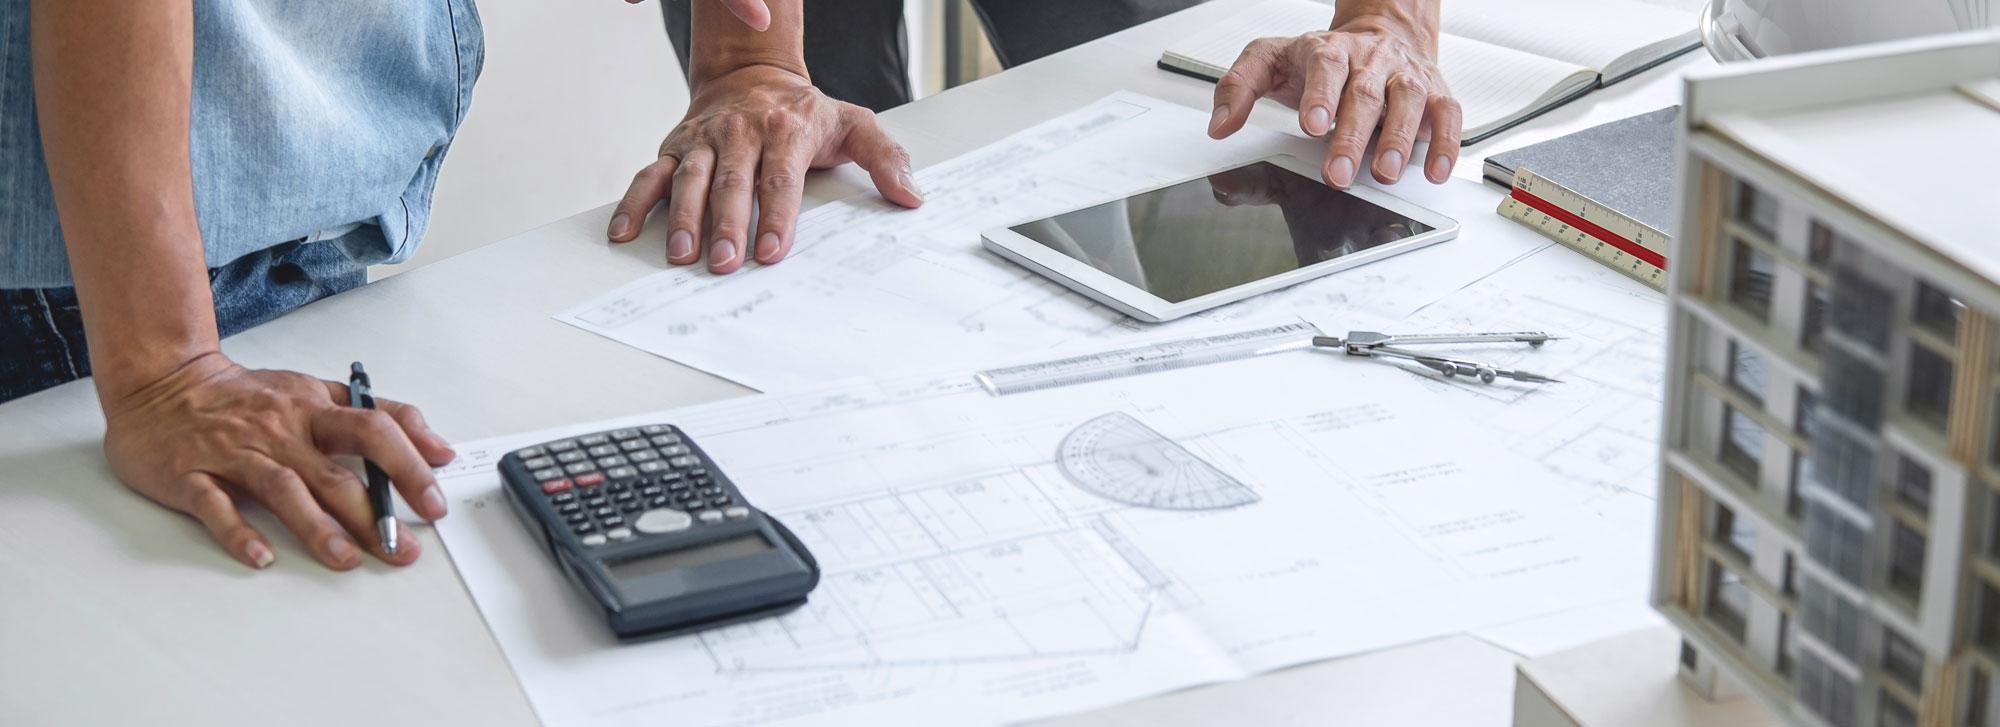 Home Renovation Designs